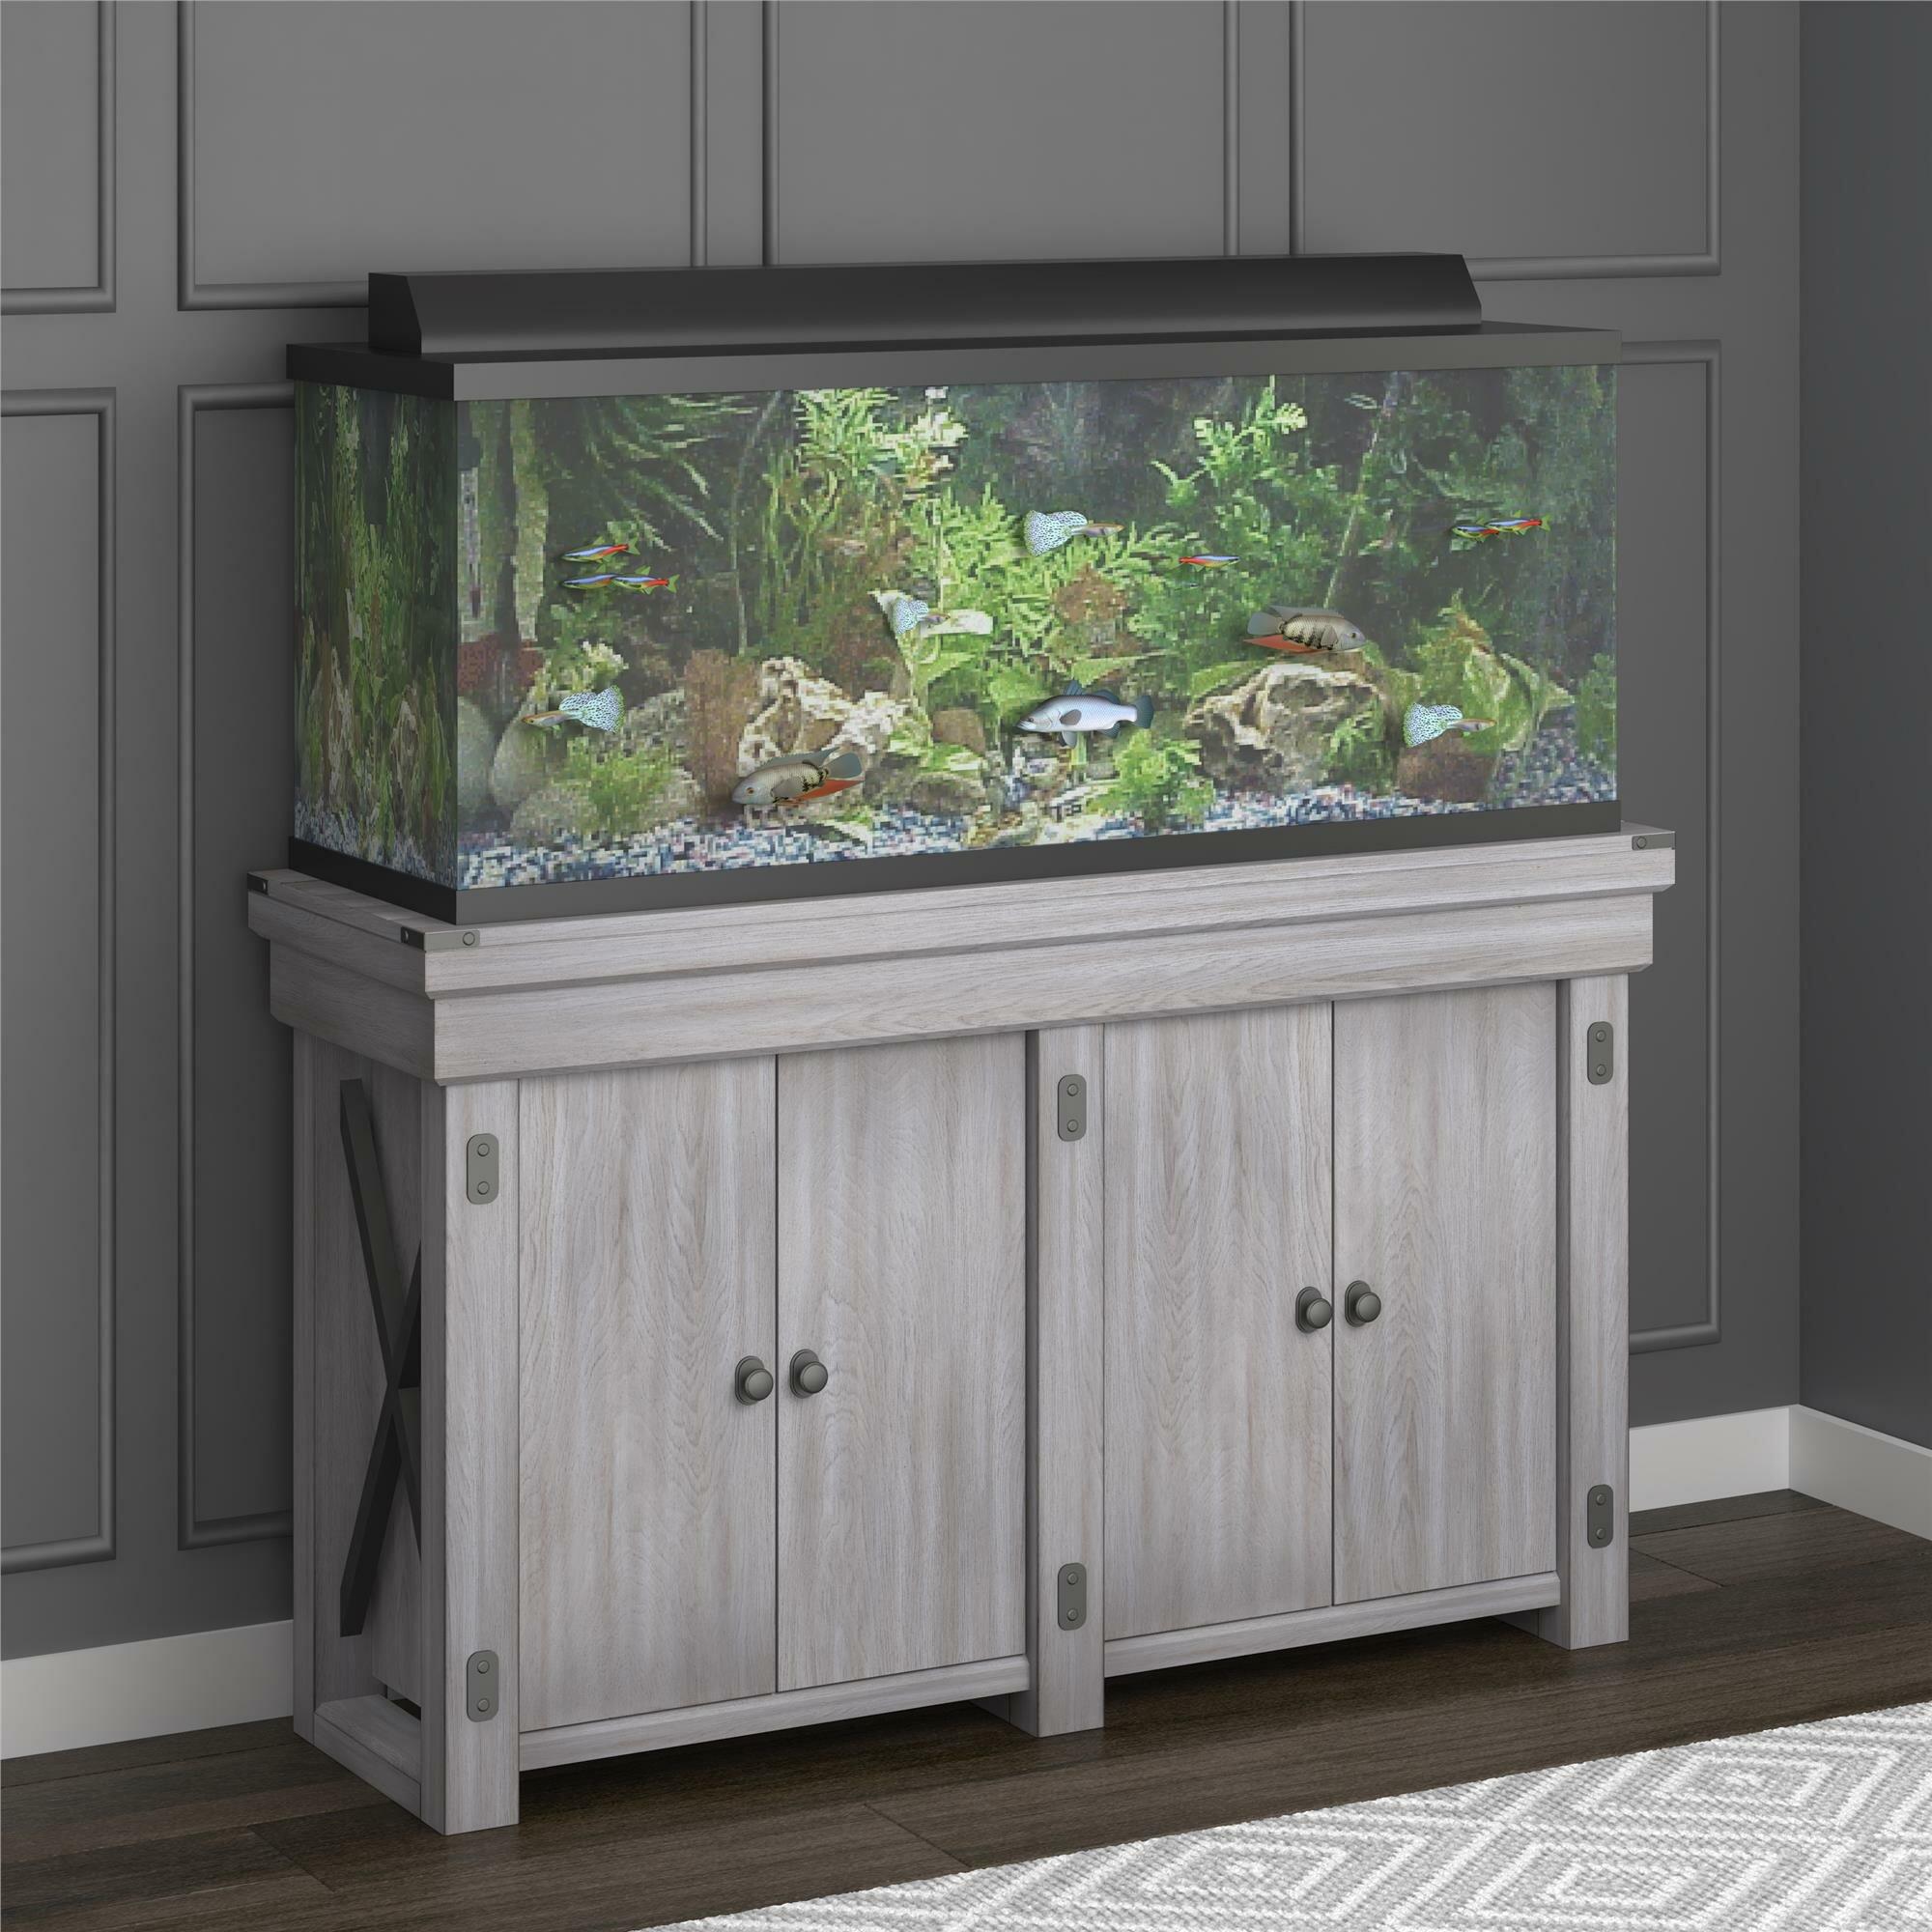 Aquarium Stand You Ll Love In 2020 Wayfair